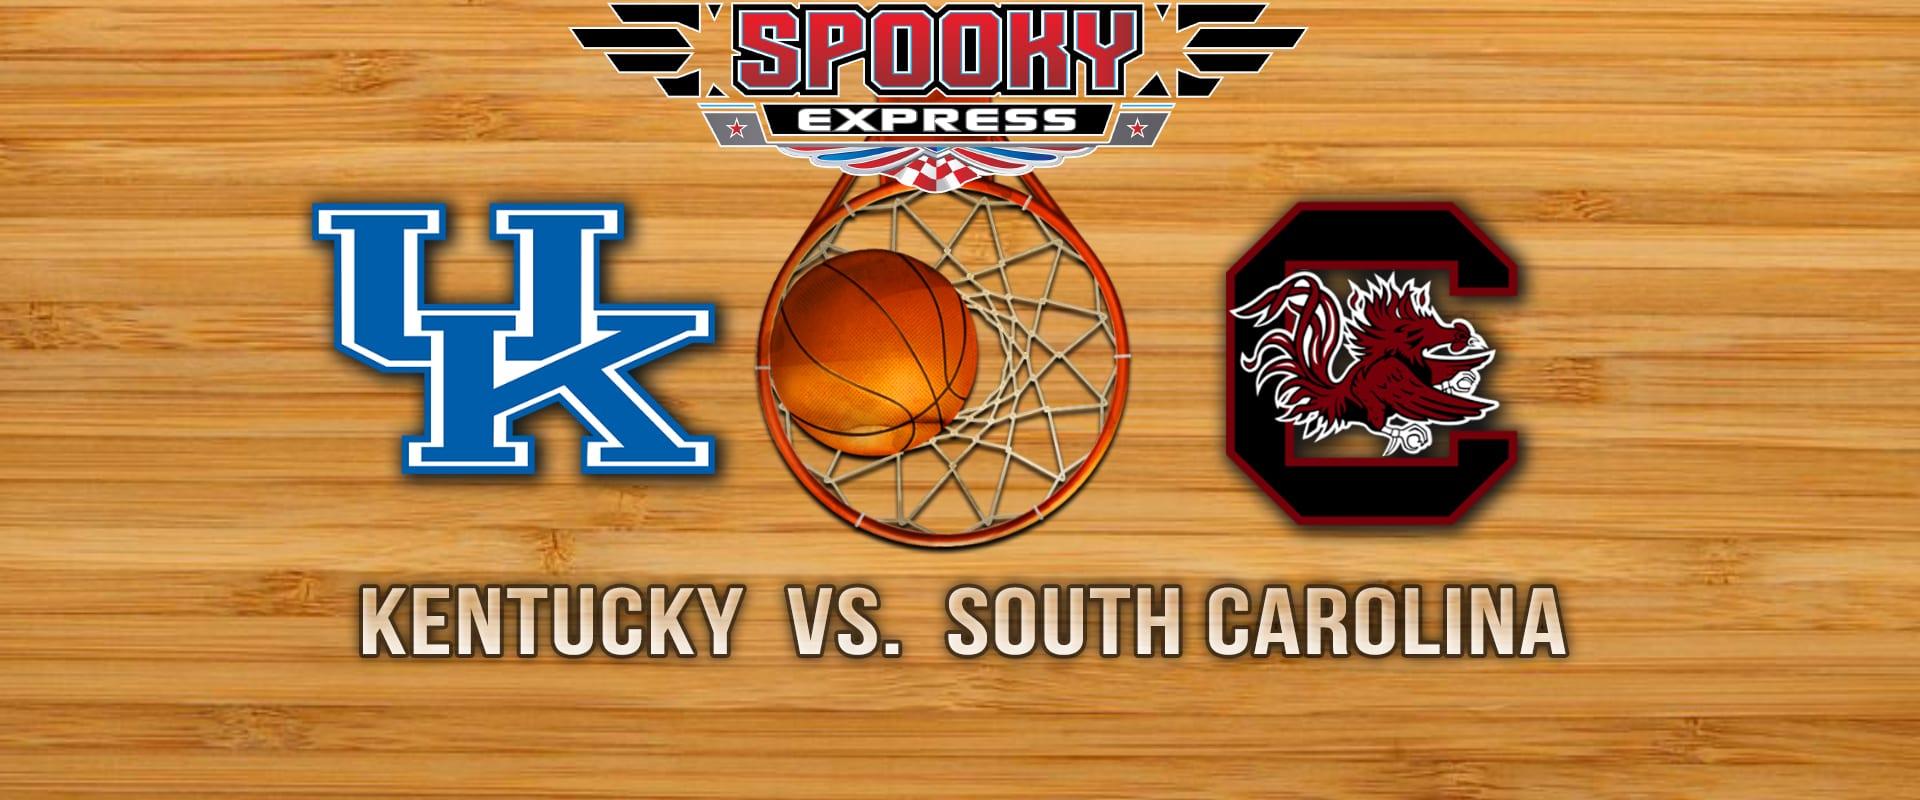 College Basketball Betting Preview Kentucky Vs South Carolina